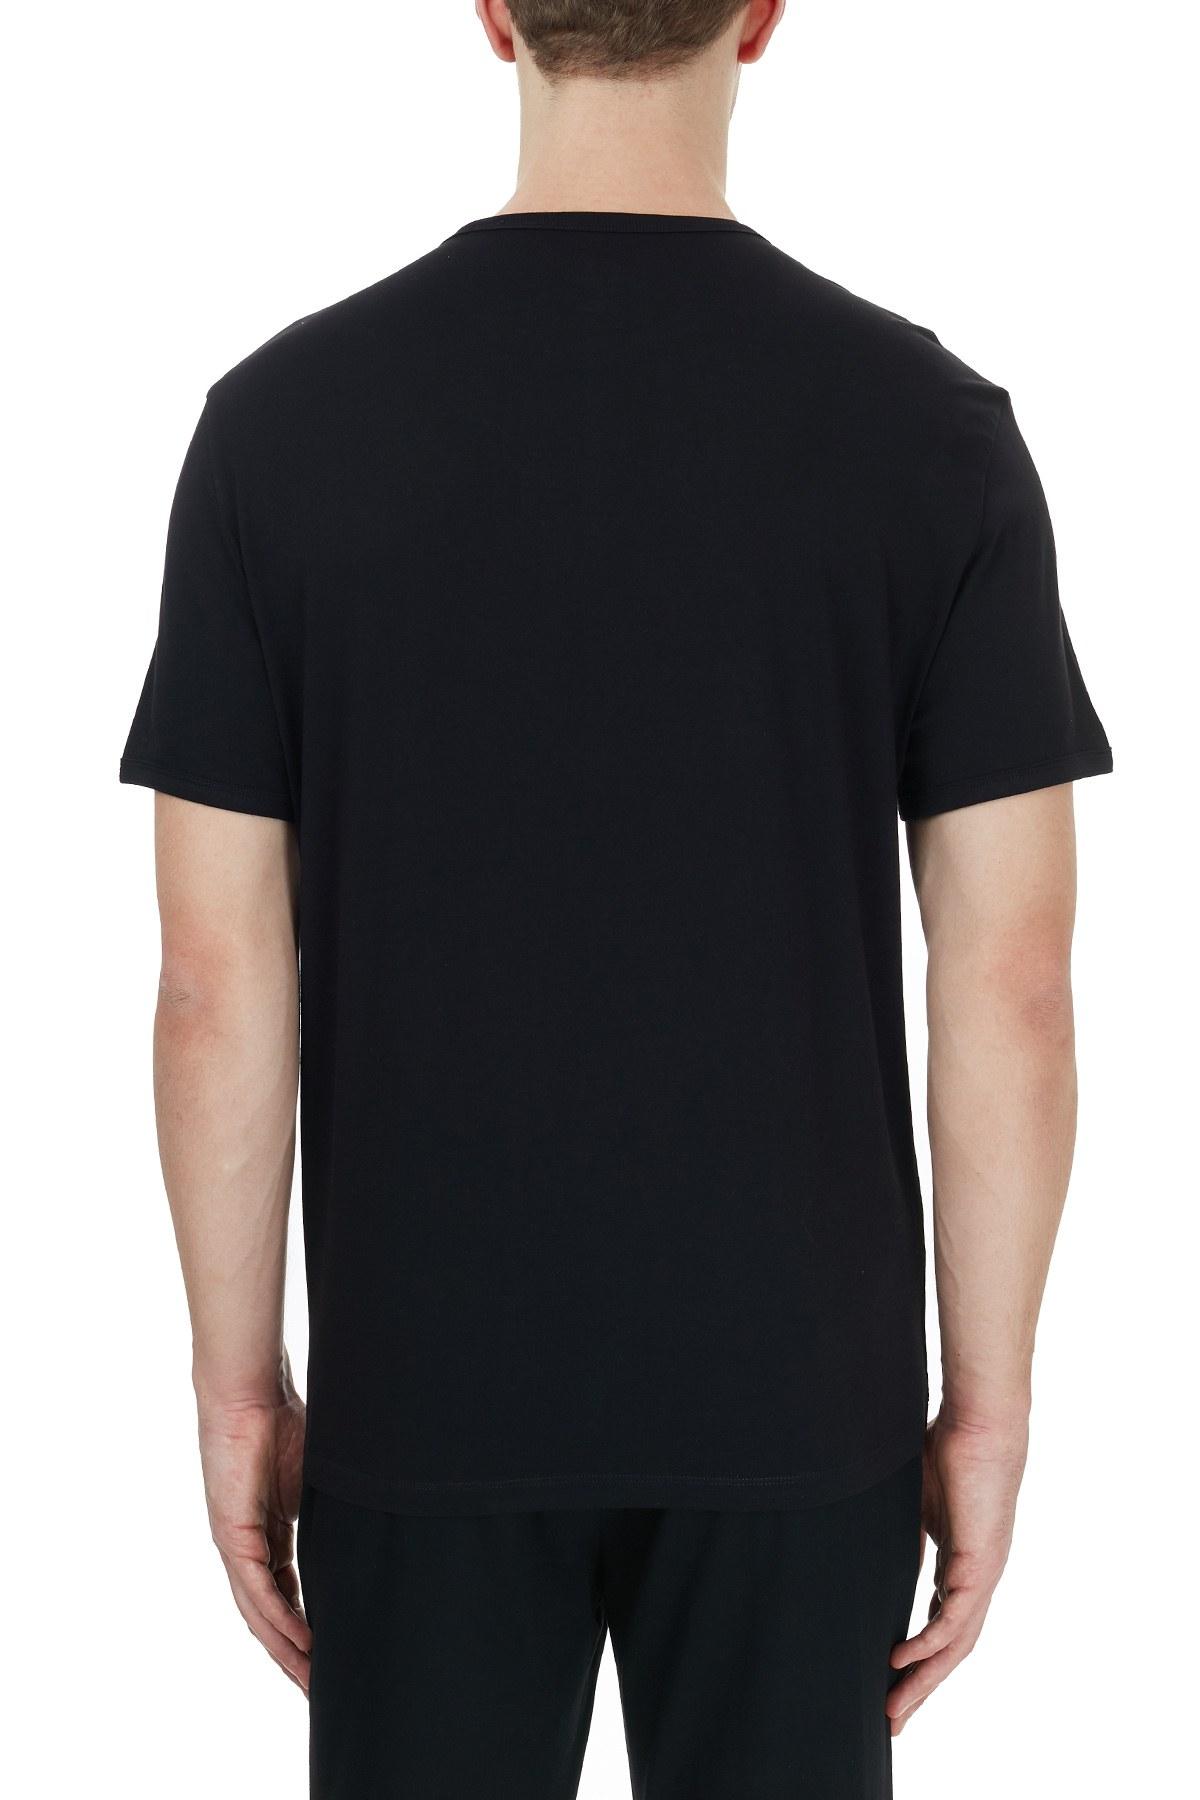 Armani Exchange % 100 Pamuklu Baskılı Bisiklet Yaka Erkek T Shirt 8NZT76 Z8H4Z 1200 SİYAH